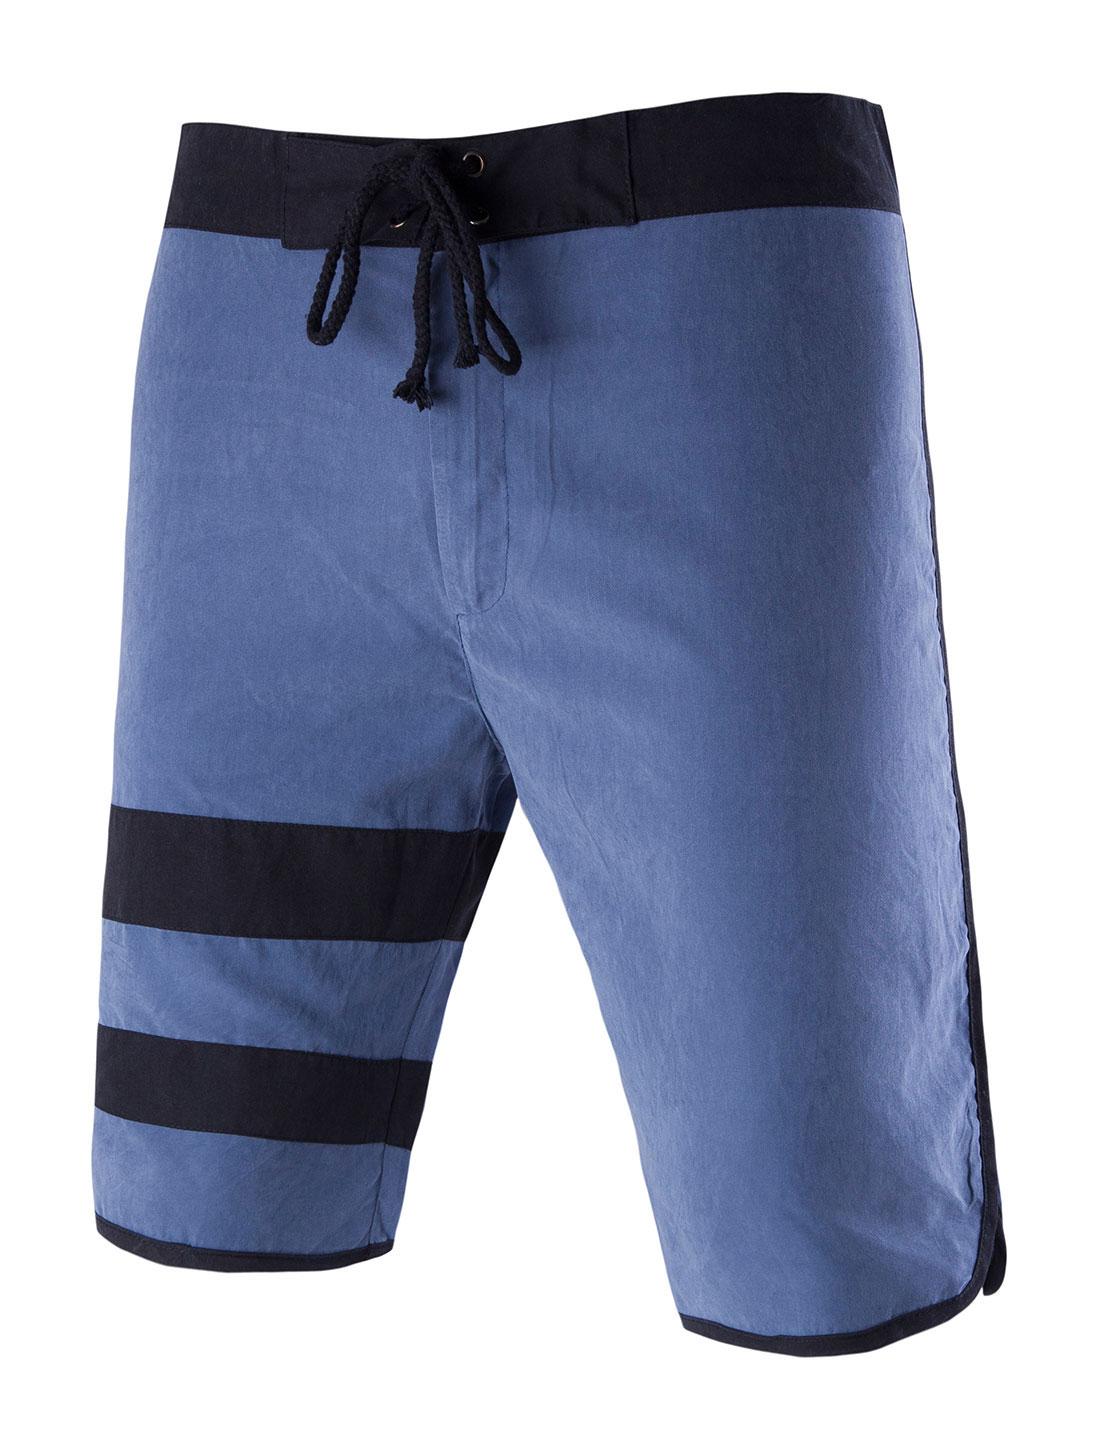 Men Drawstring Waist Contrast Color Beach Shorts Blue W34